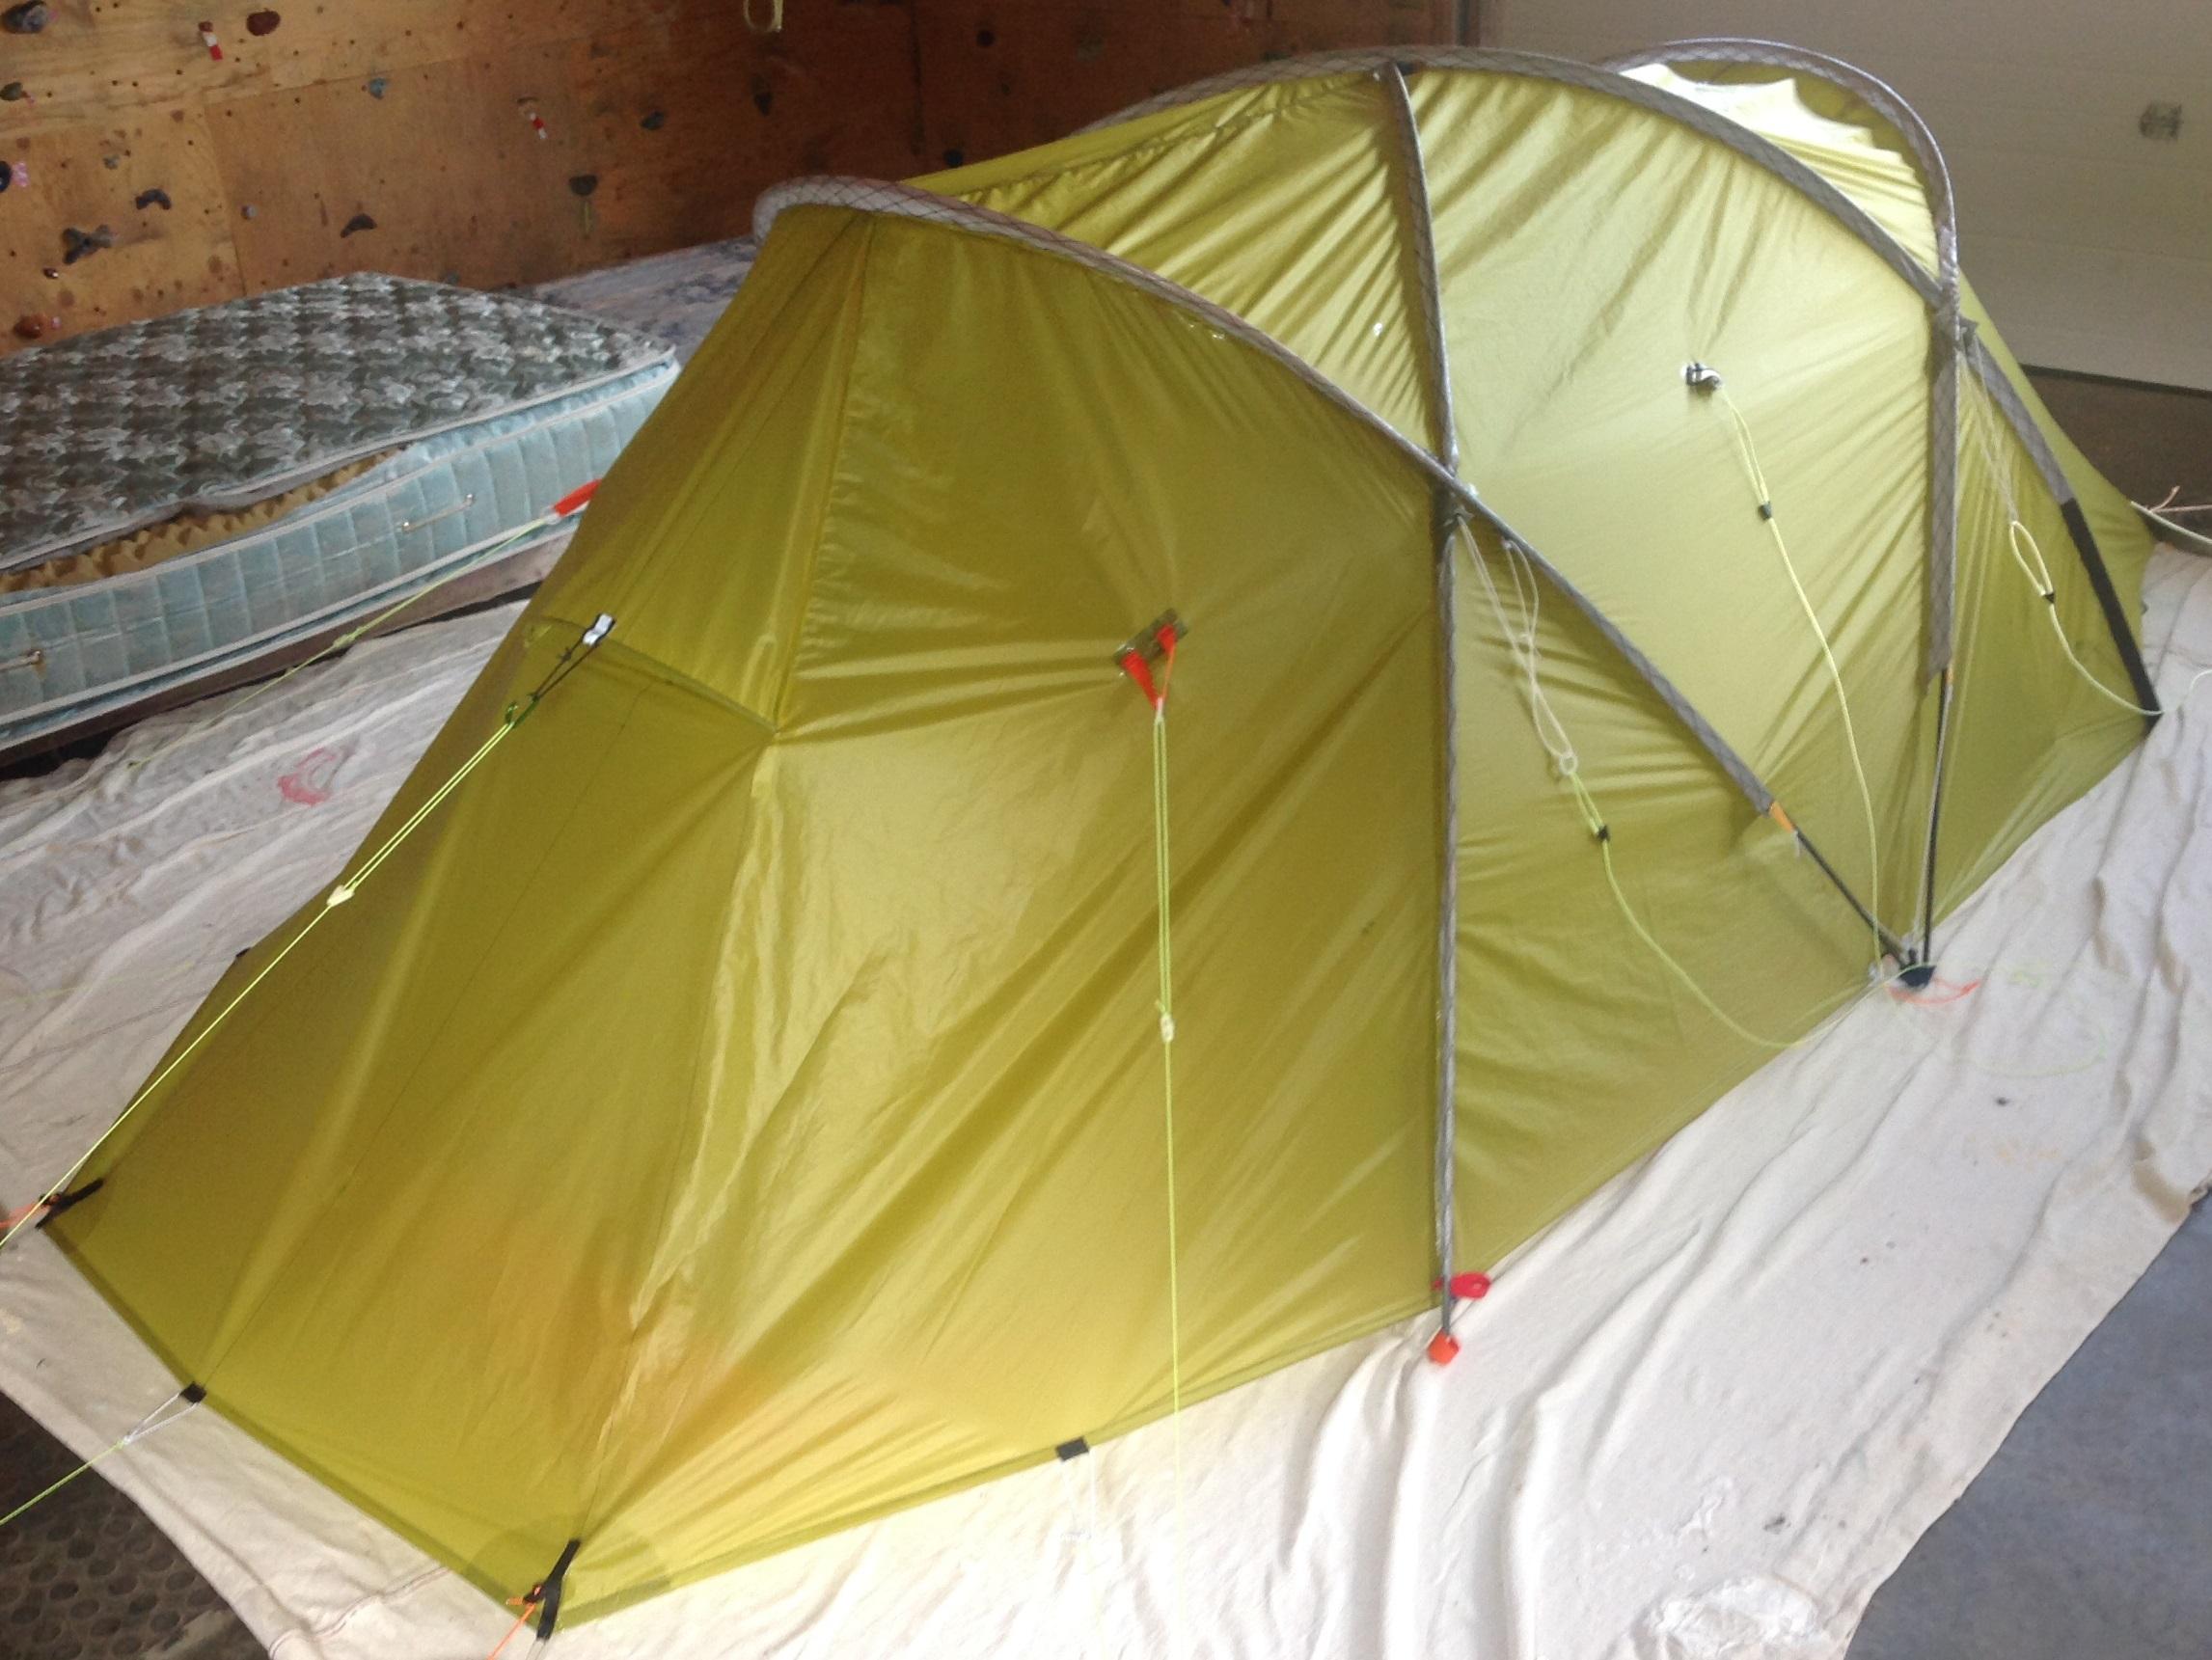 Myog 2p 4 season semi-geodesic tent & Myog 2p 4 season semi-geodesic tent - Backpacking Light